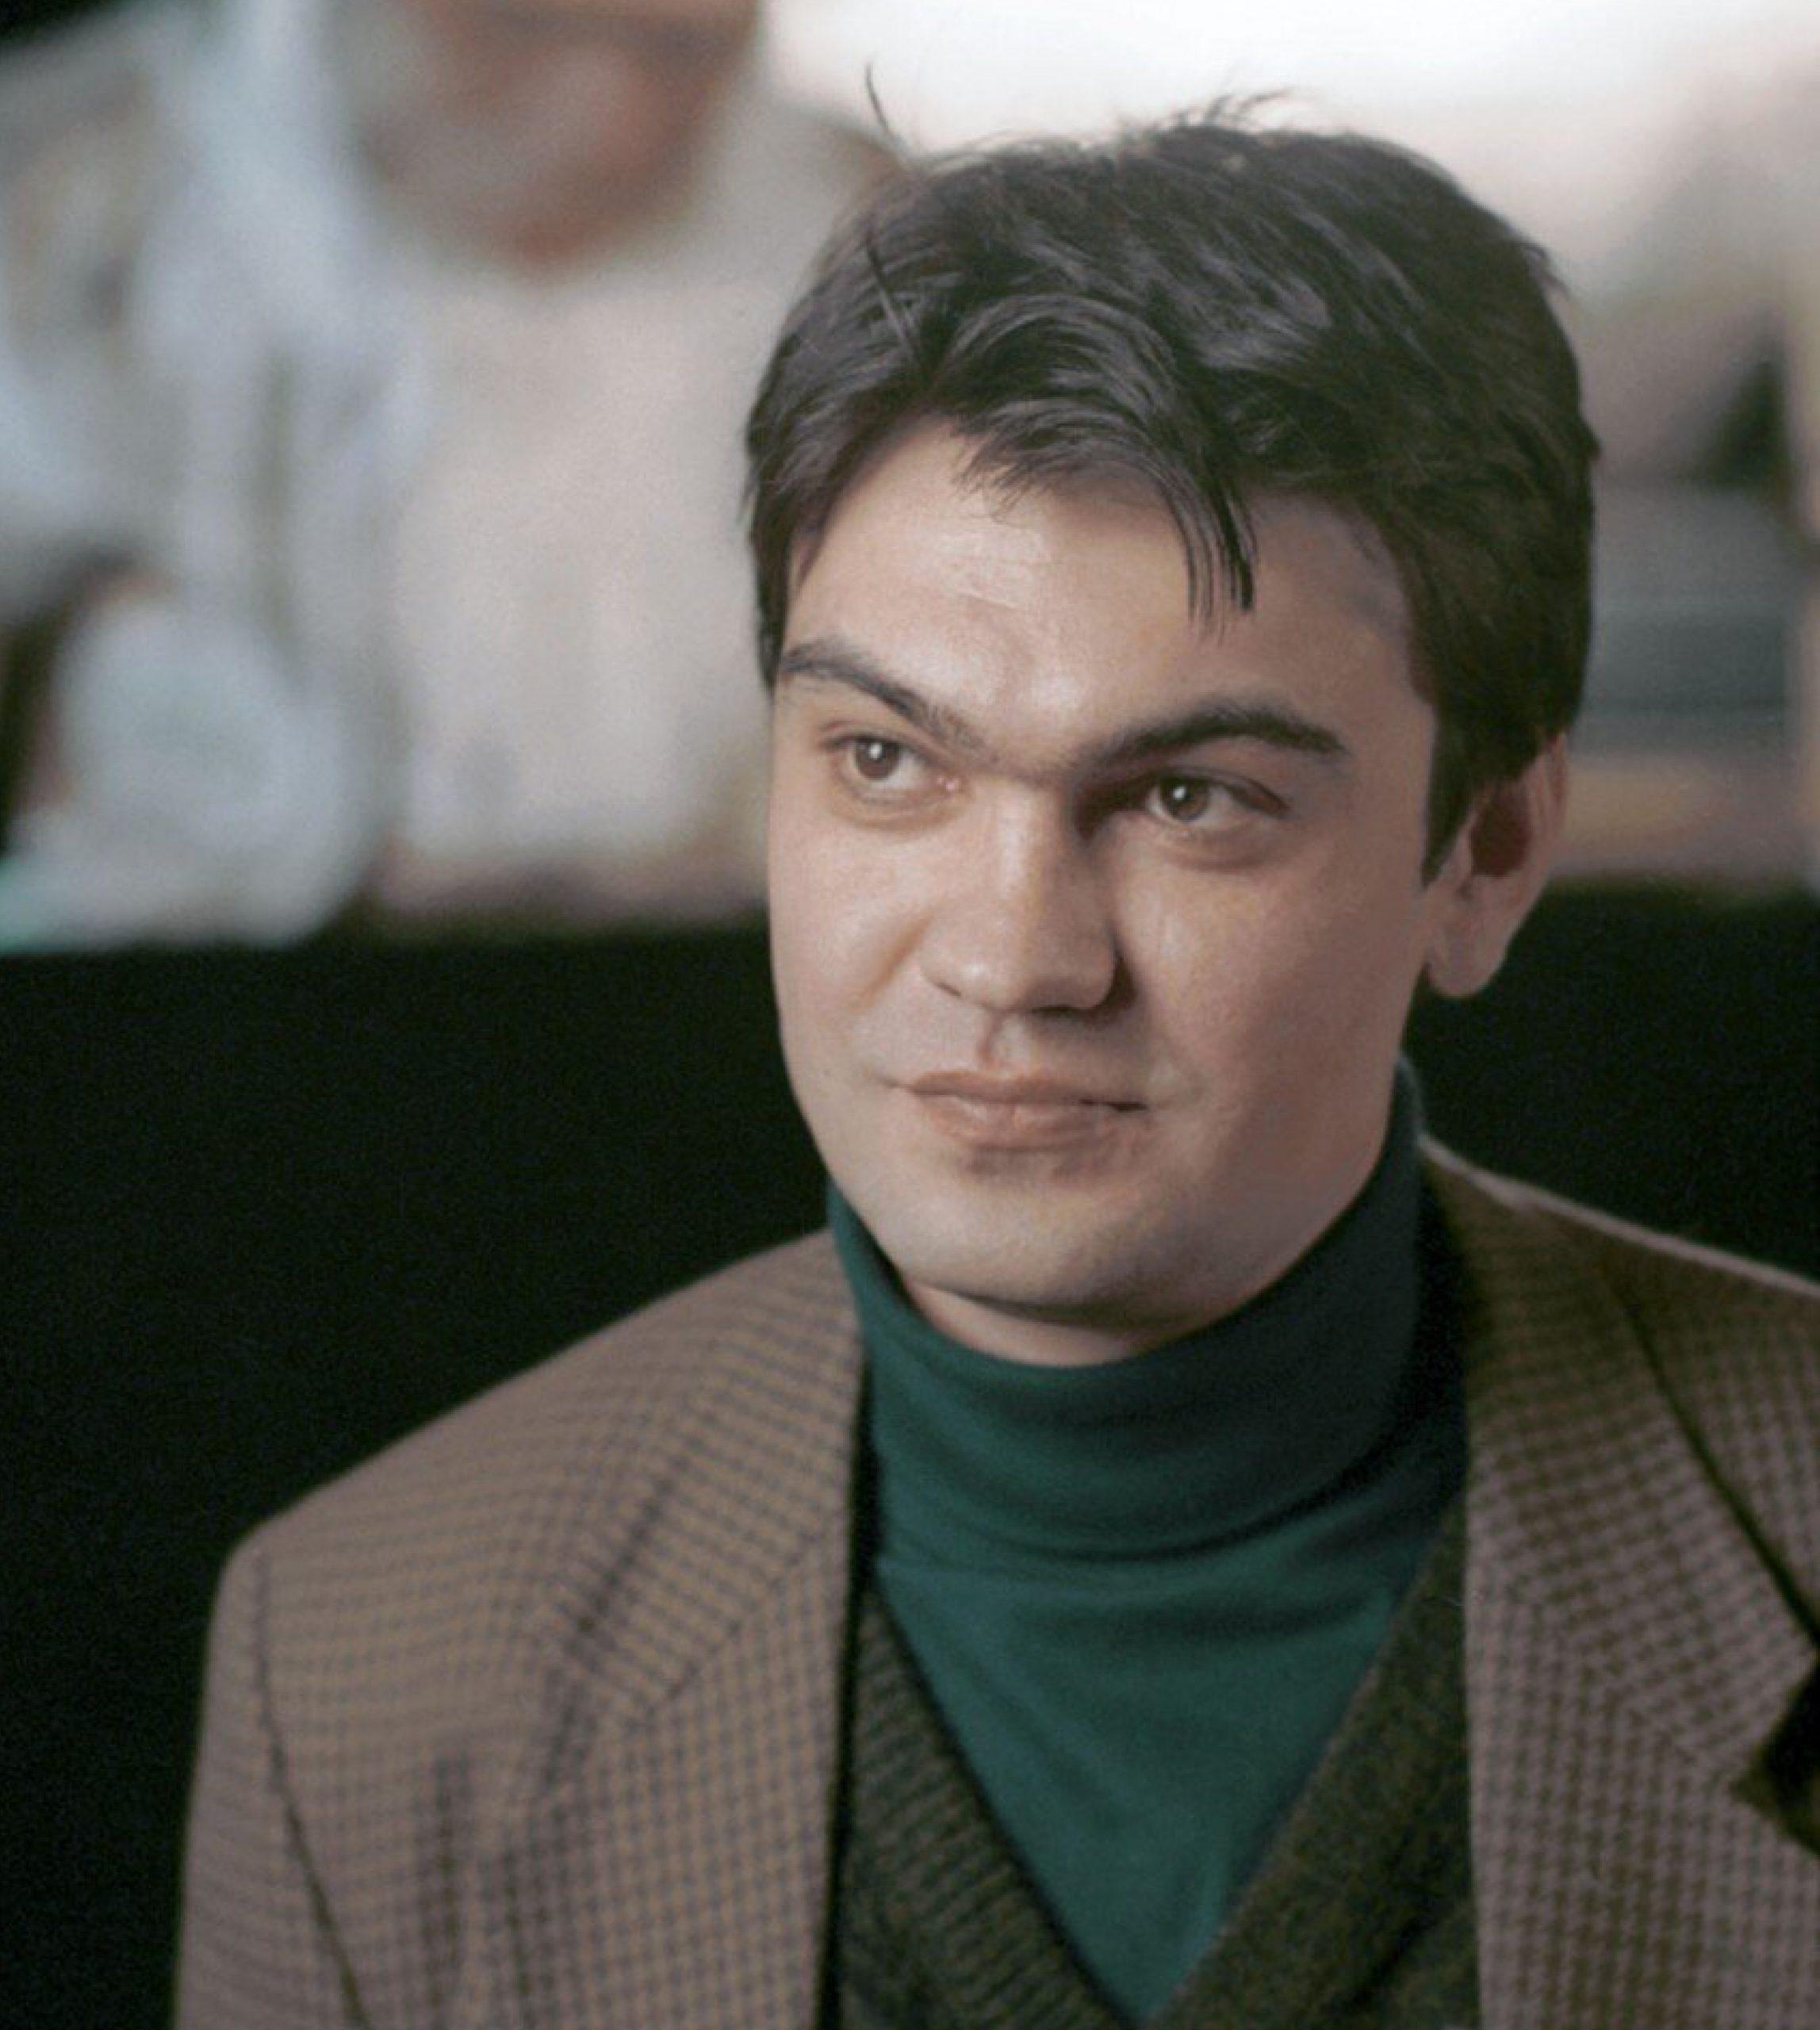 Vasili Pichul